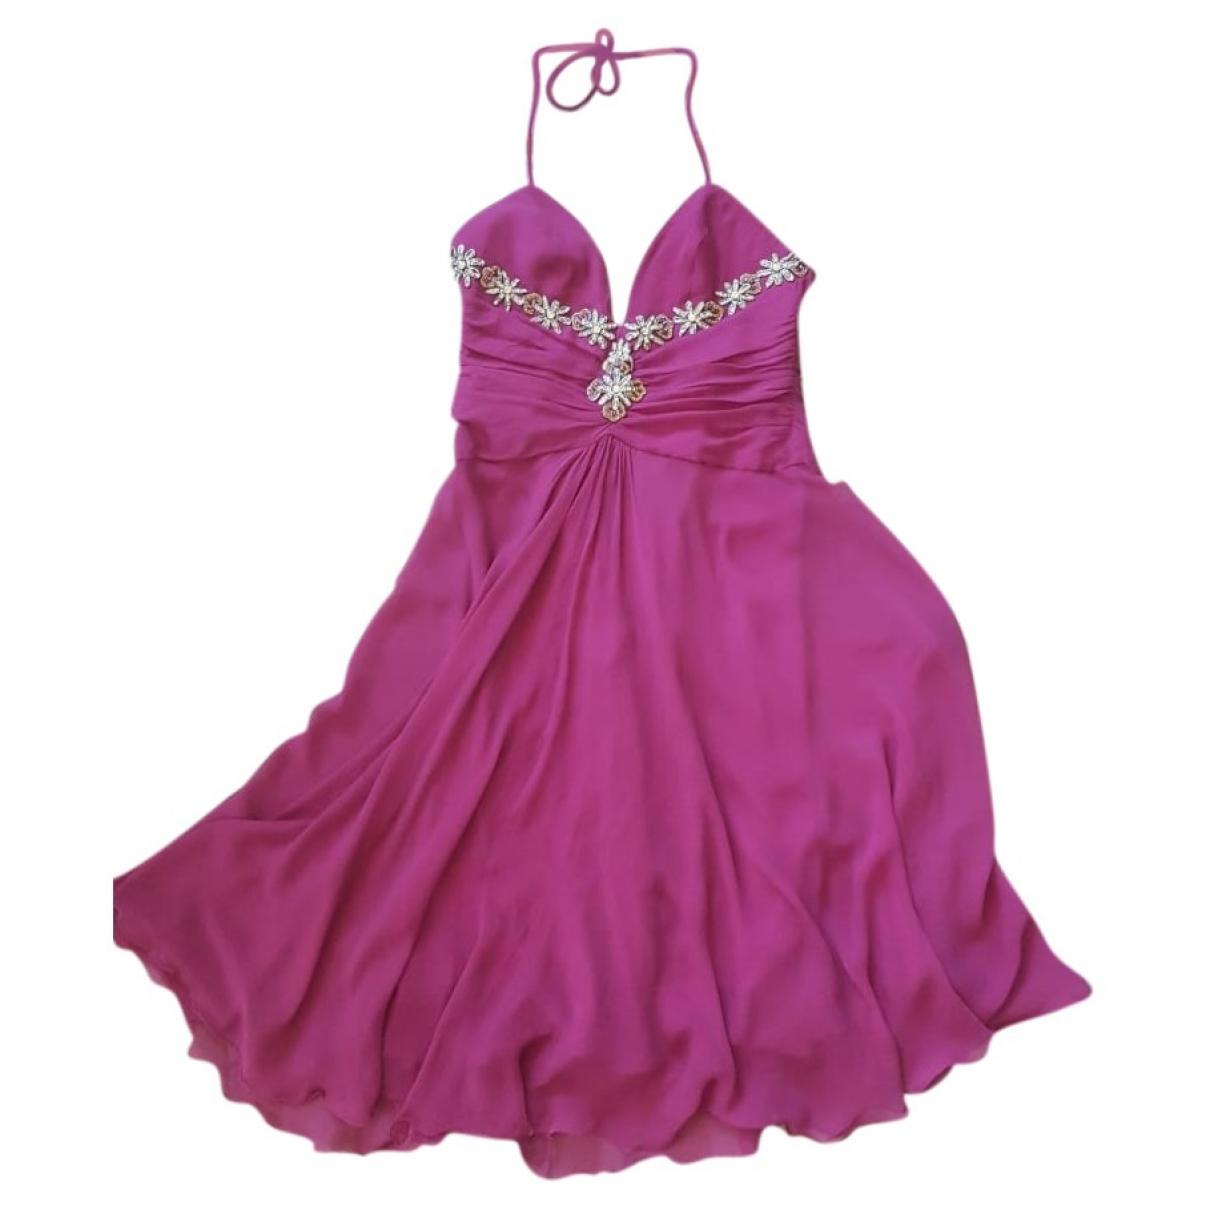 Max Mara \N Kleid in  Lila Seide